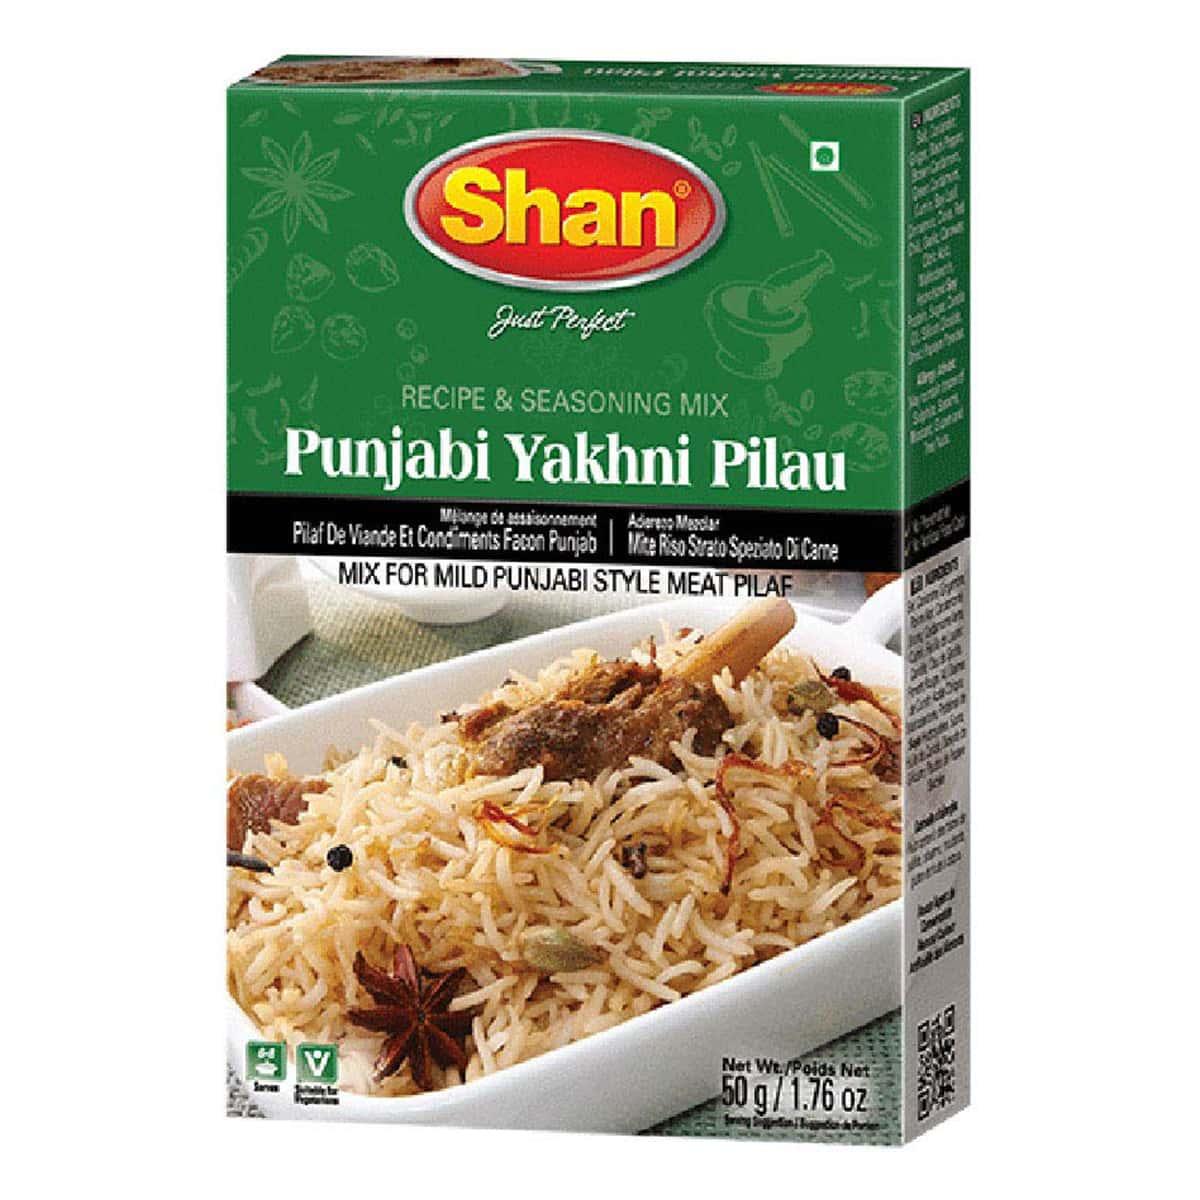 Buy Shan Punjabi Yakhni Pilau Mix - 50 gm